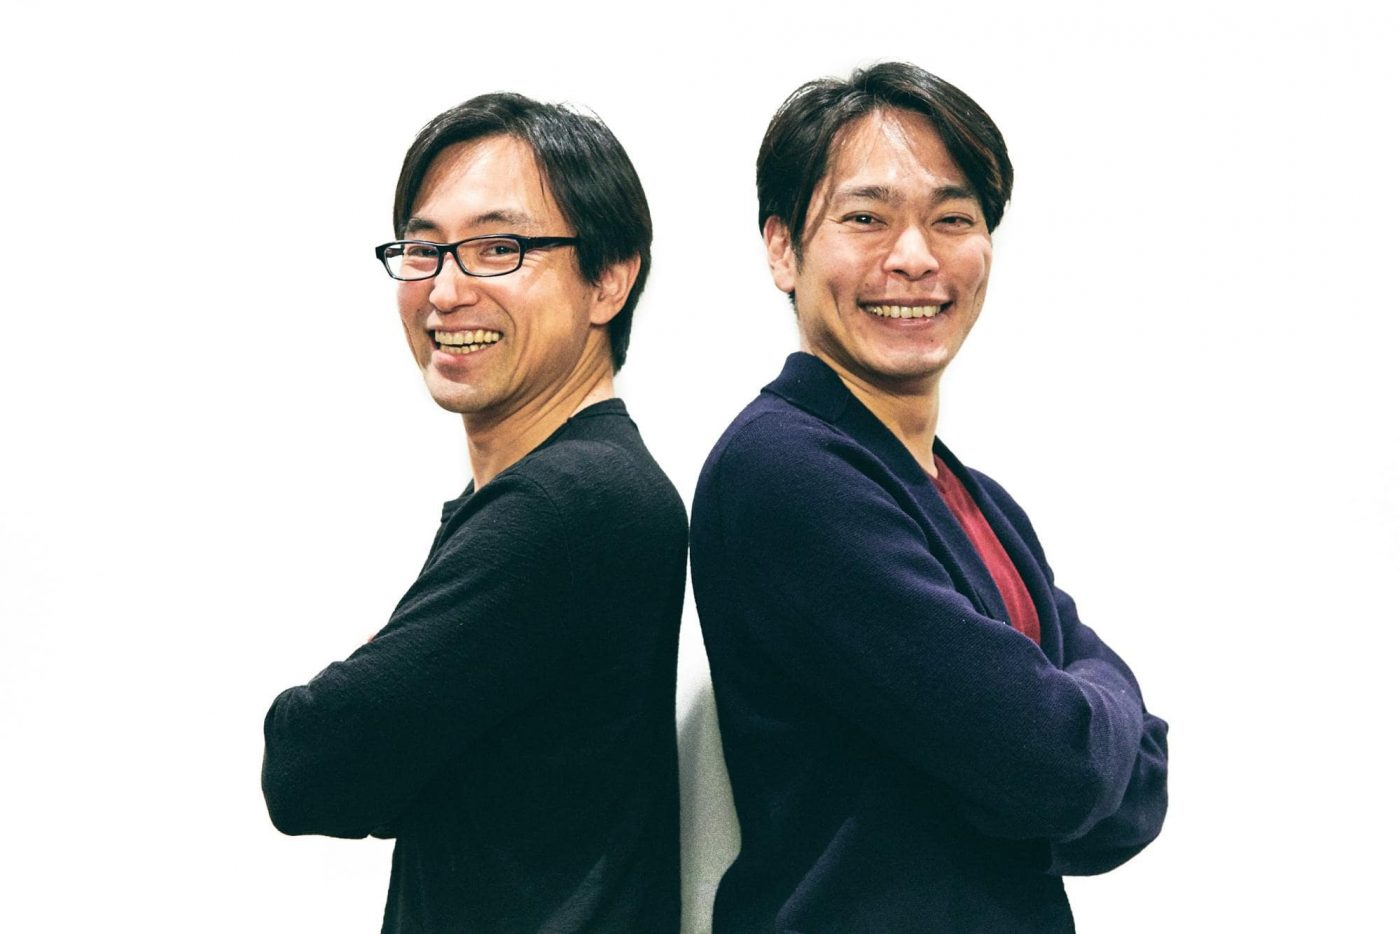 Retty、Five、WealthNavi、Kakehashi、KaizenPlatformなどへの出資実績で知られるGREE Venturesの堤達生氏が、3本めとなる150億円規模の新ファンド組成を2019年5月14日に発表、新ブランド「STRIVE」として活動を開始